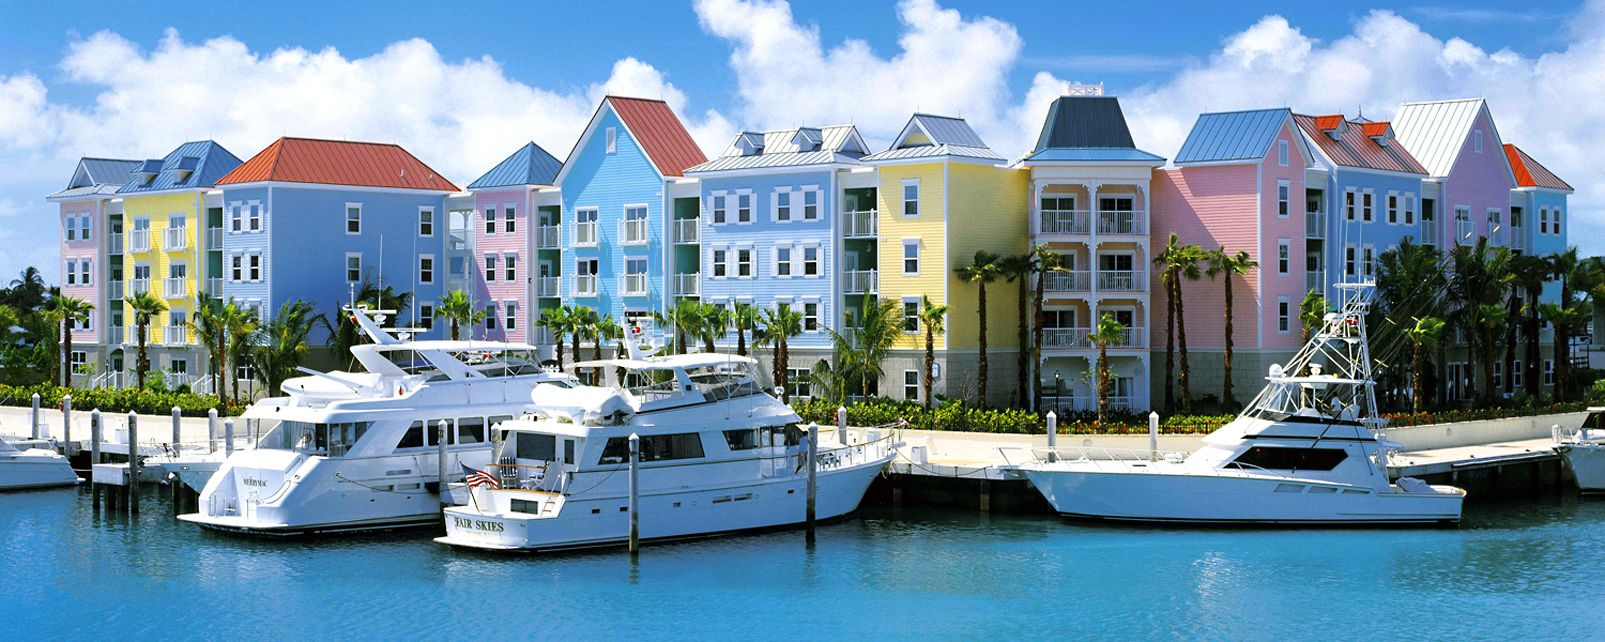 Hotel Atlantis - Bahamas